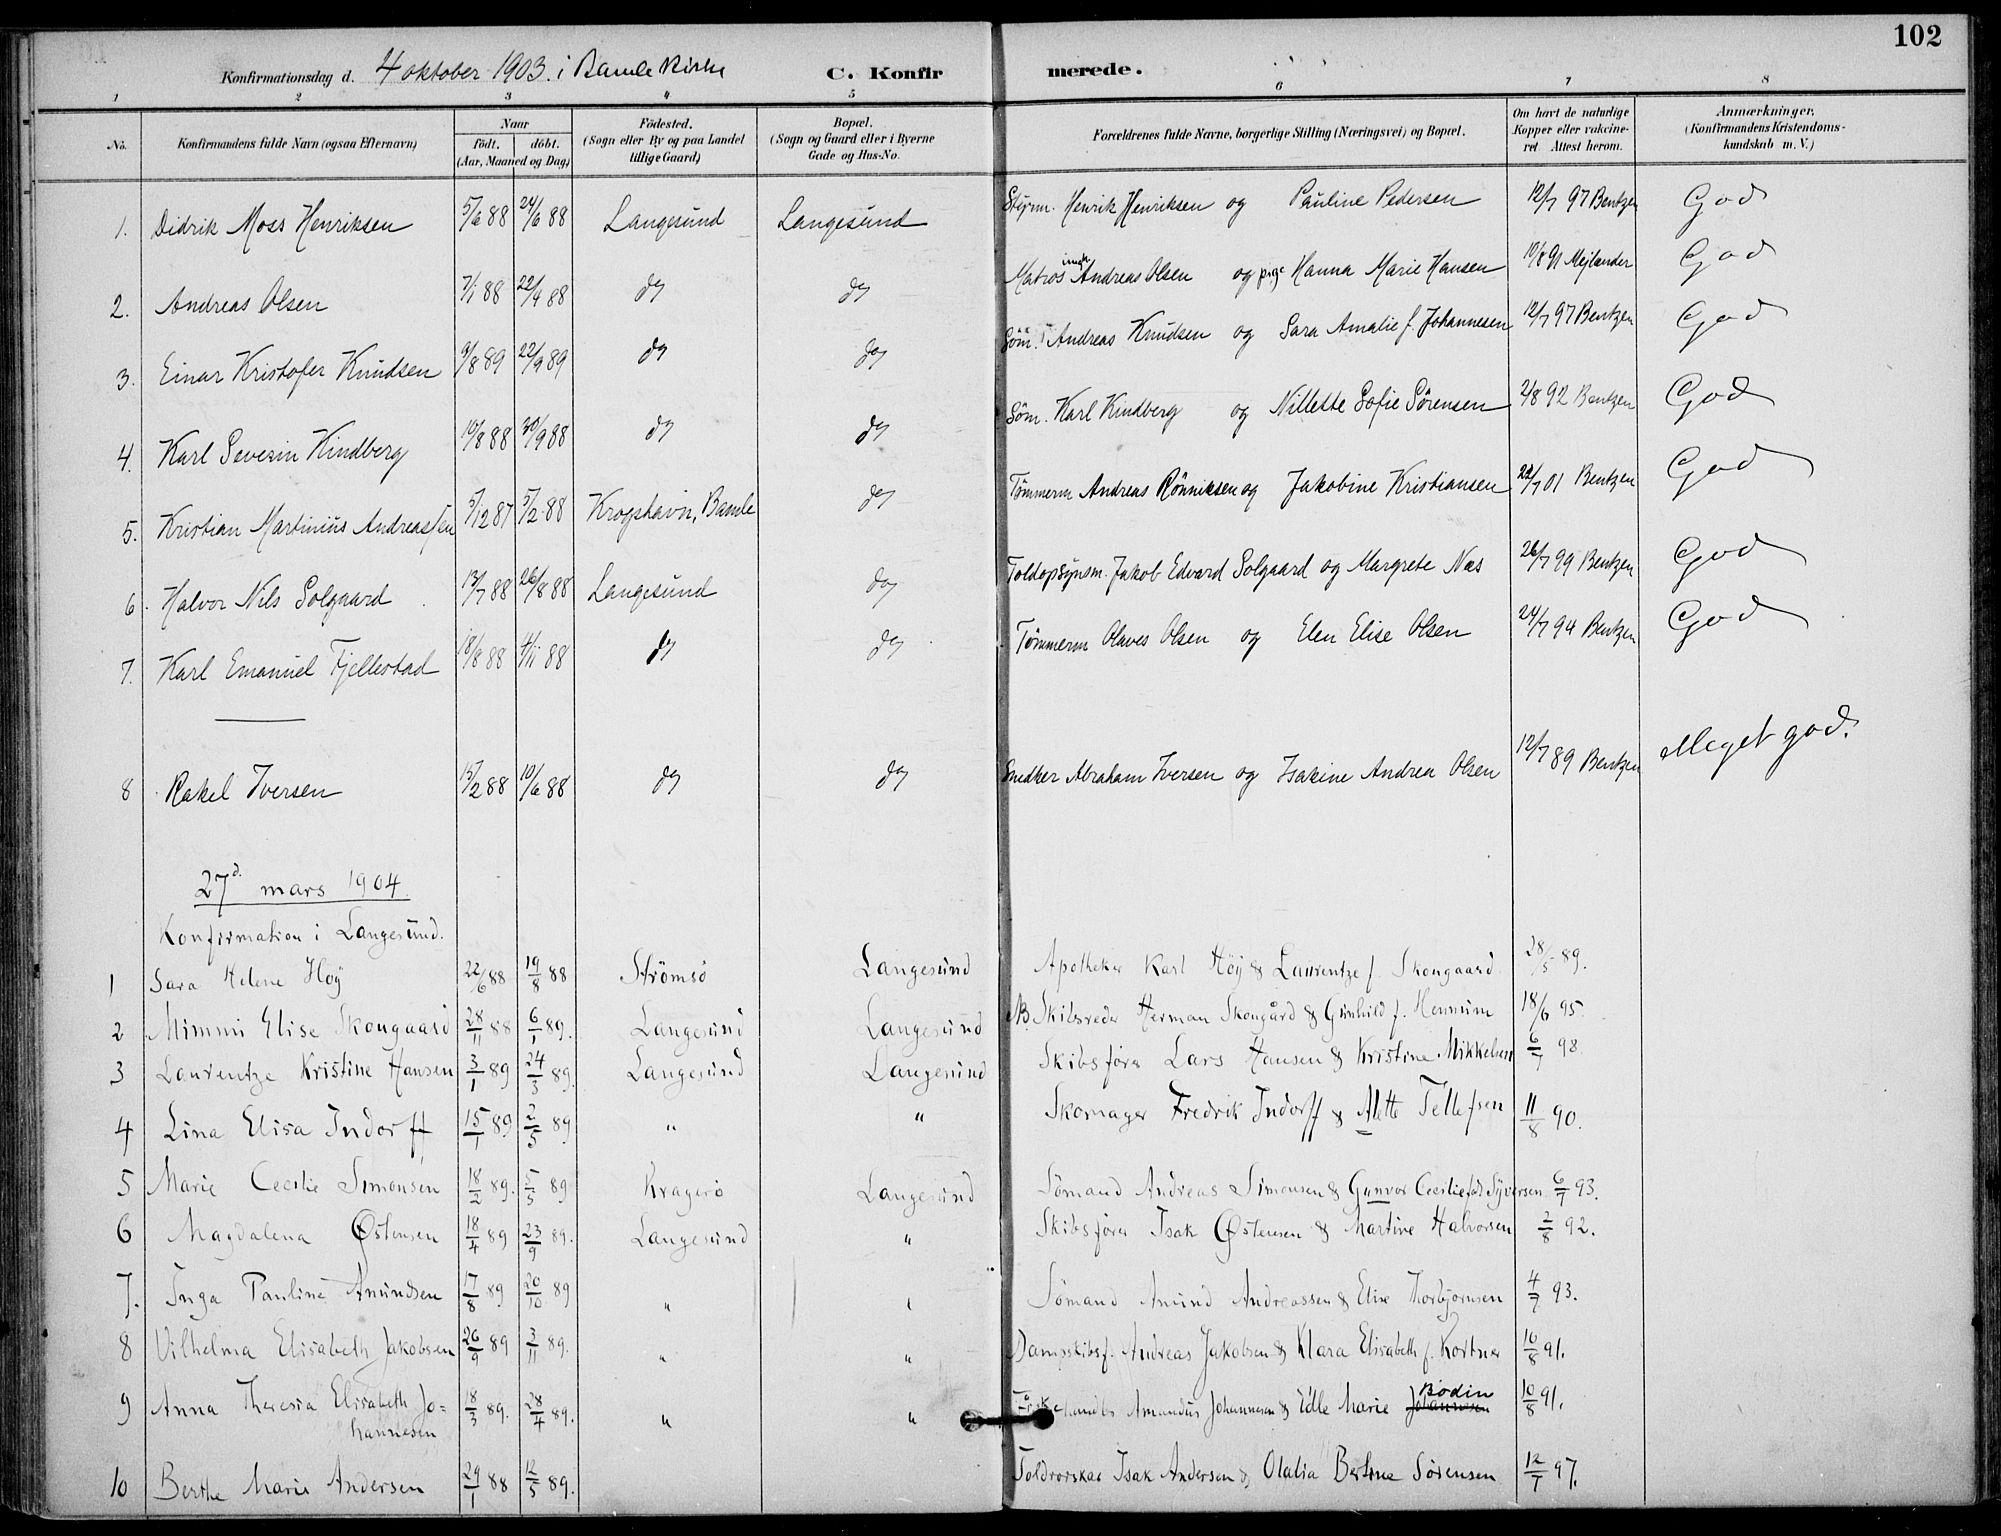 SAKO, Langesund kirkebøker, F/Fa/L0003: Ministerialbok nr. 3, 1893-1907, s. 102